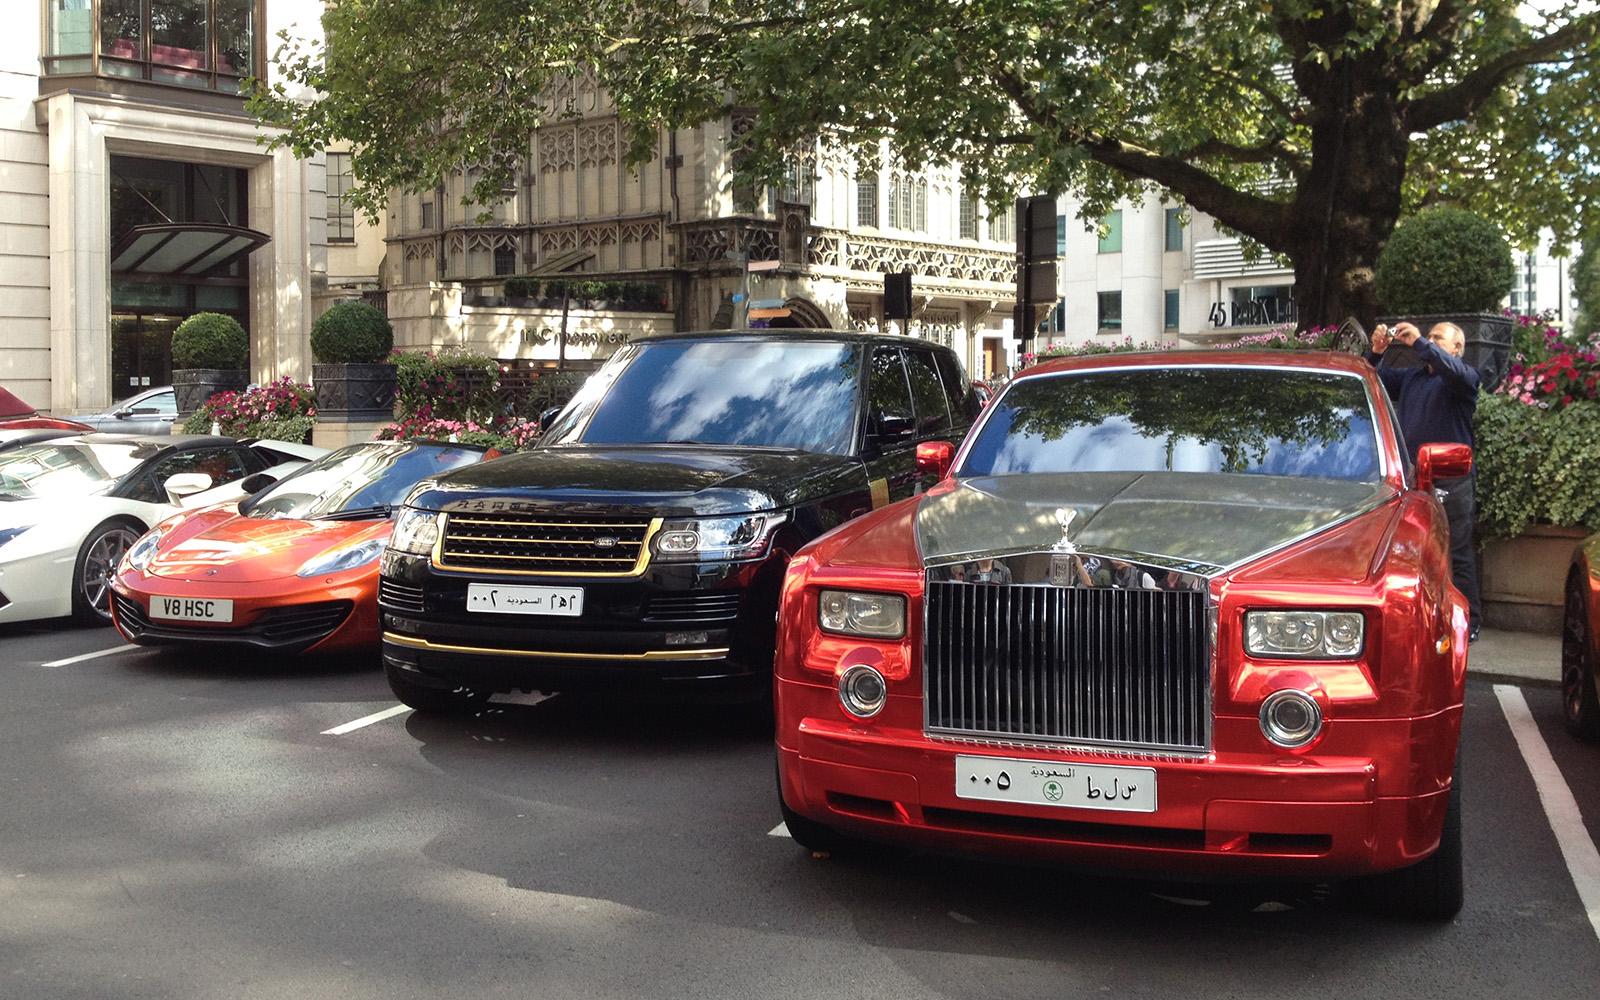 Car Park Near Buckingham Palace Road